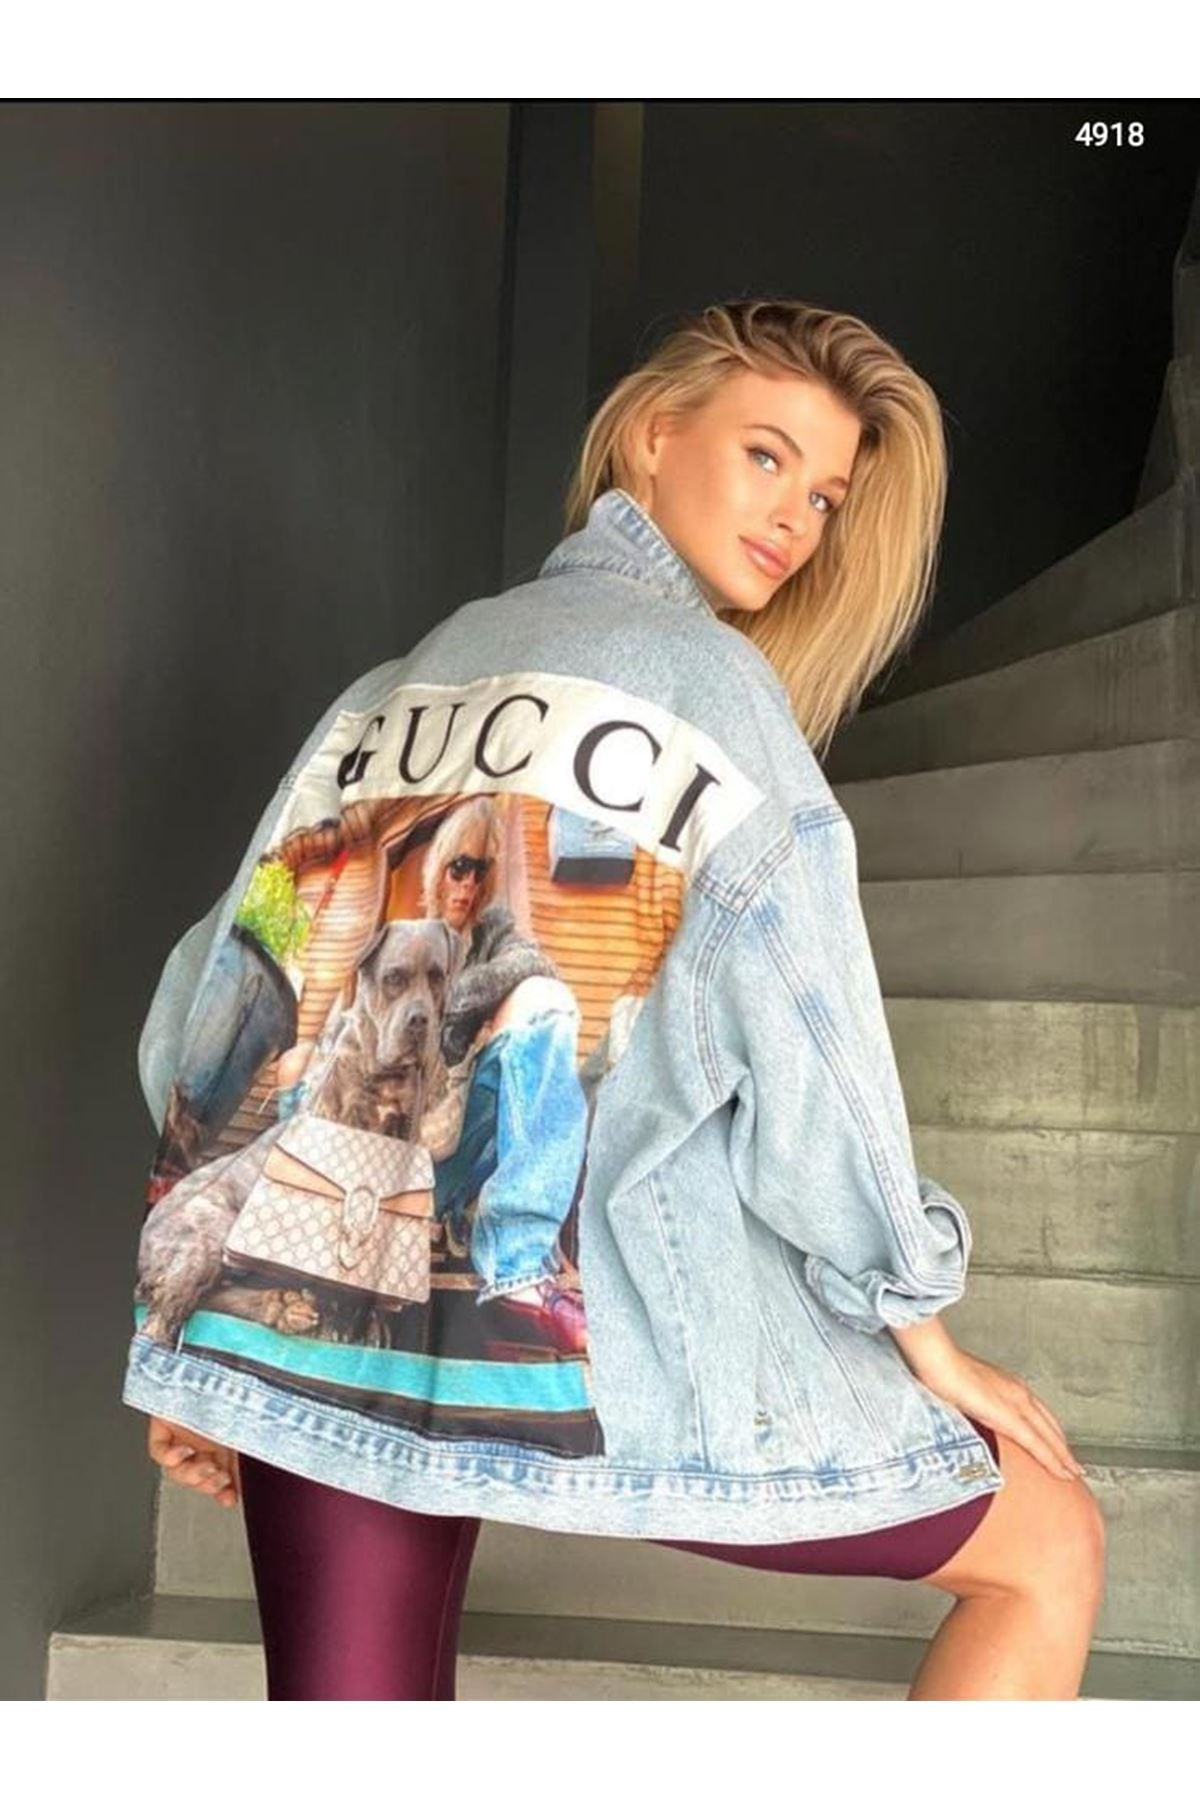 GUCC Model Baskılı Kot Ceket - MAVİ